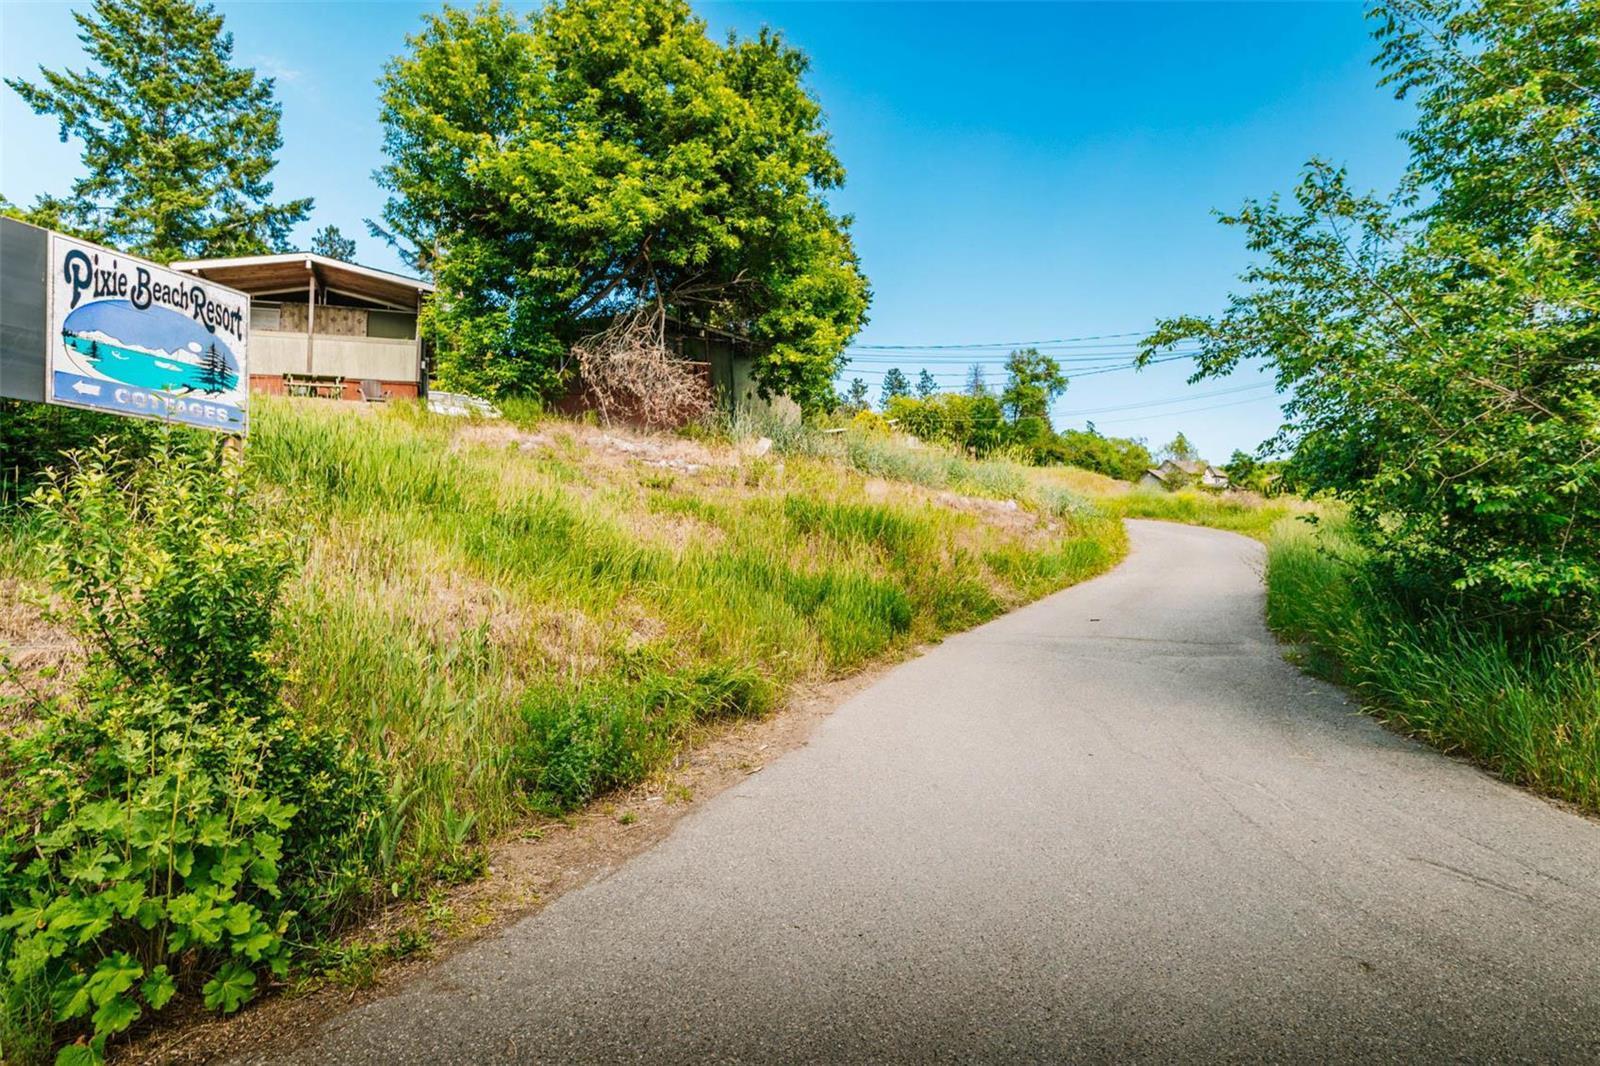 12815 Pixton Road, Sw, Lake Country, British Columbia  V4V 1C9 - Photo 36 - 10238768